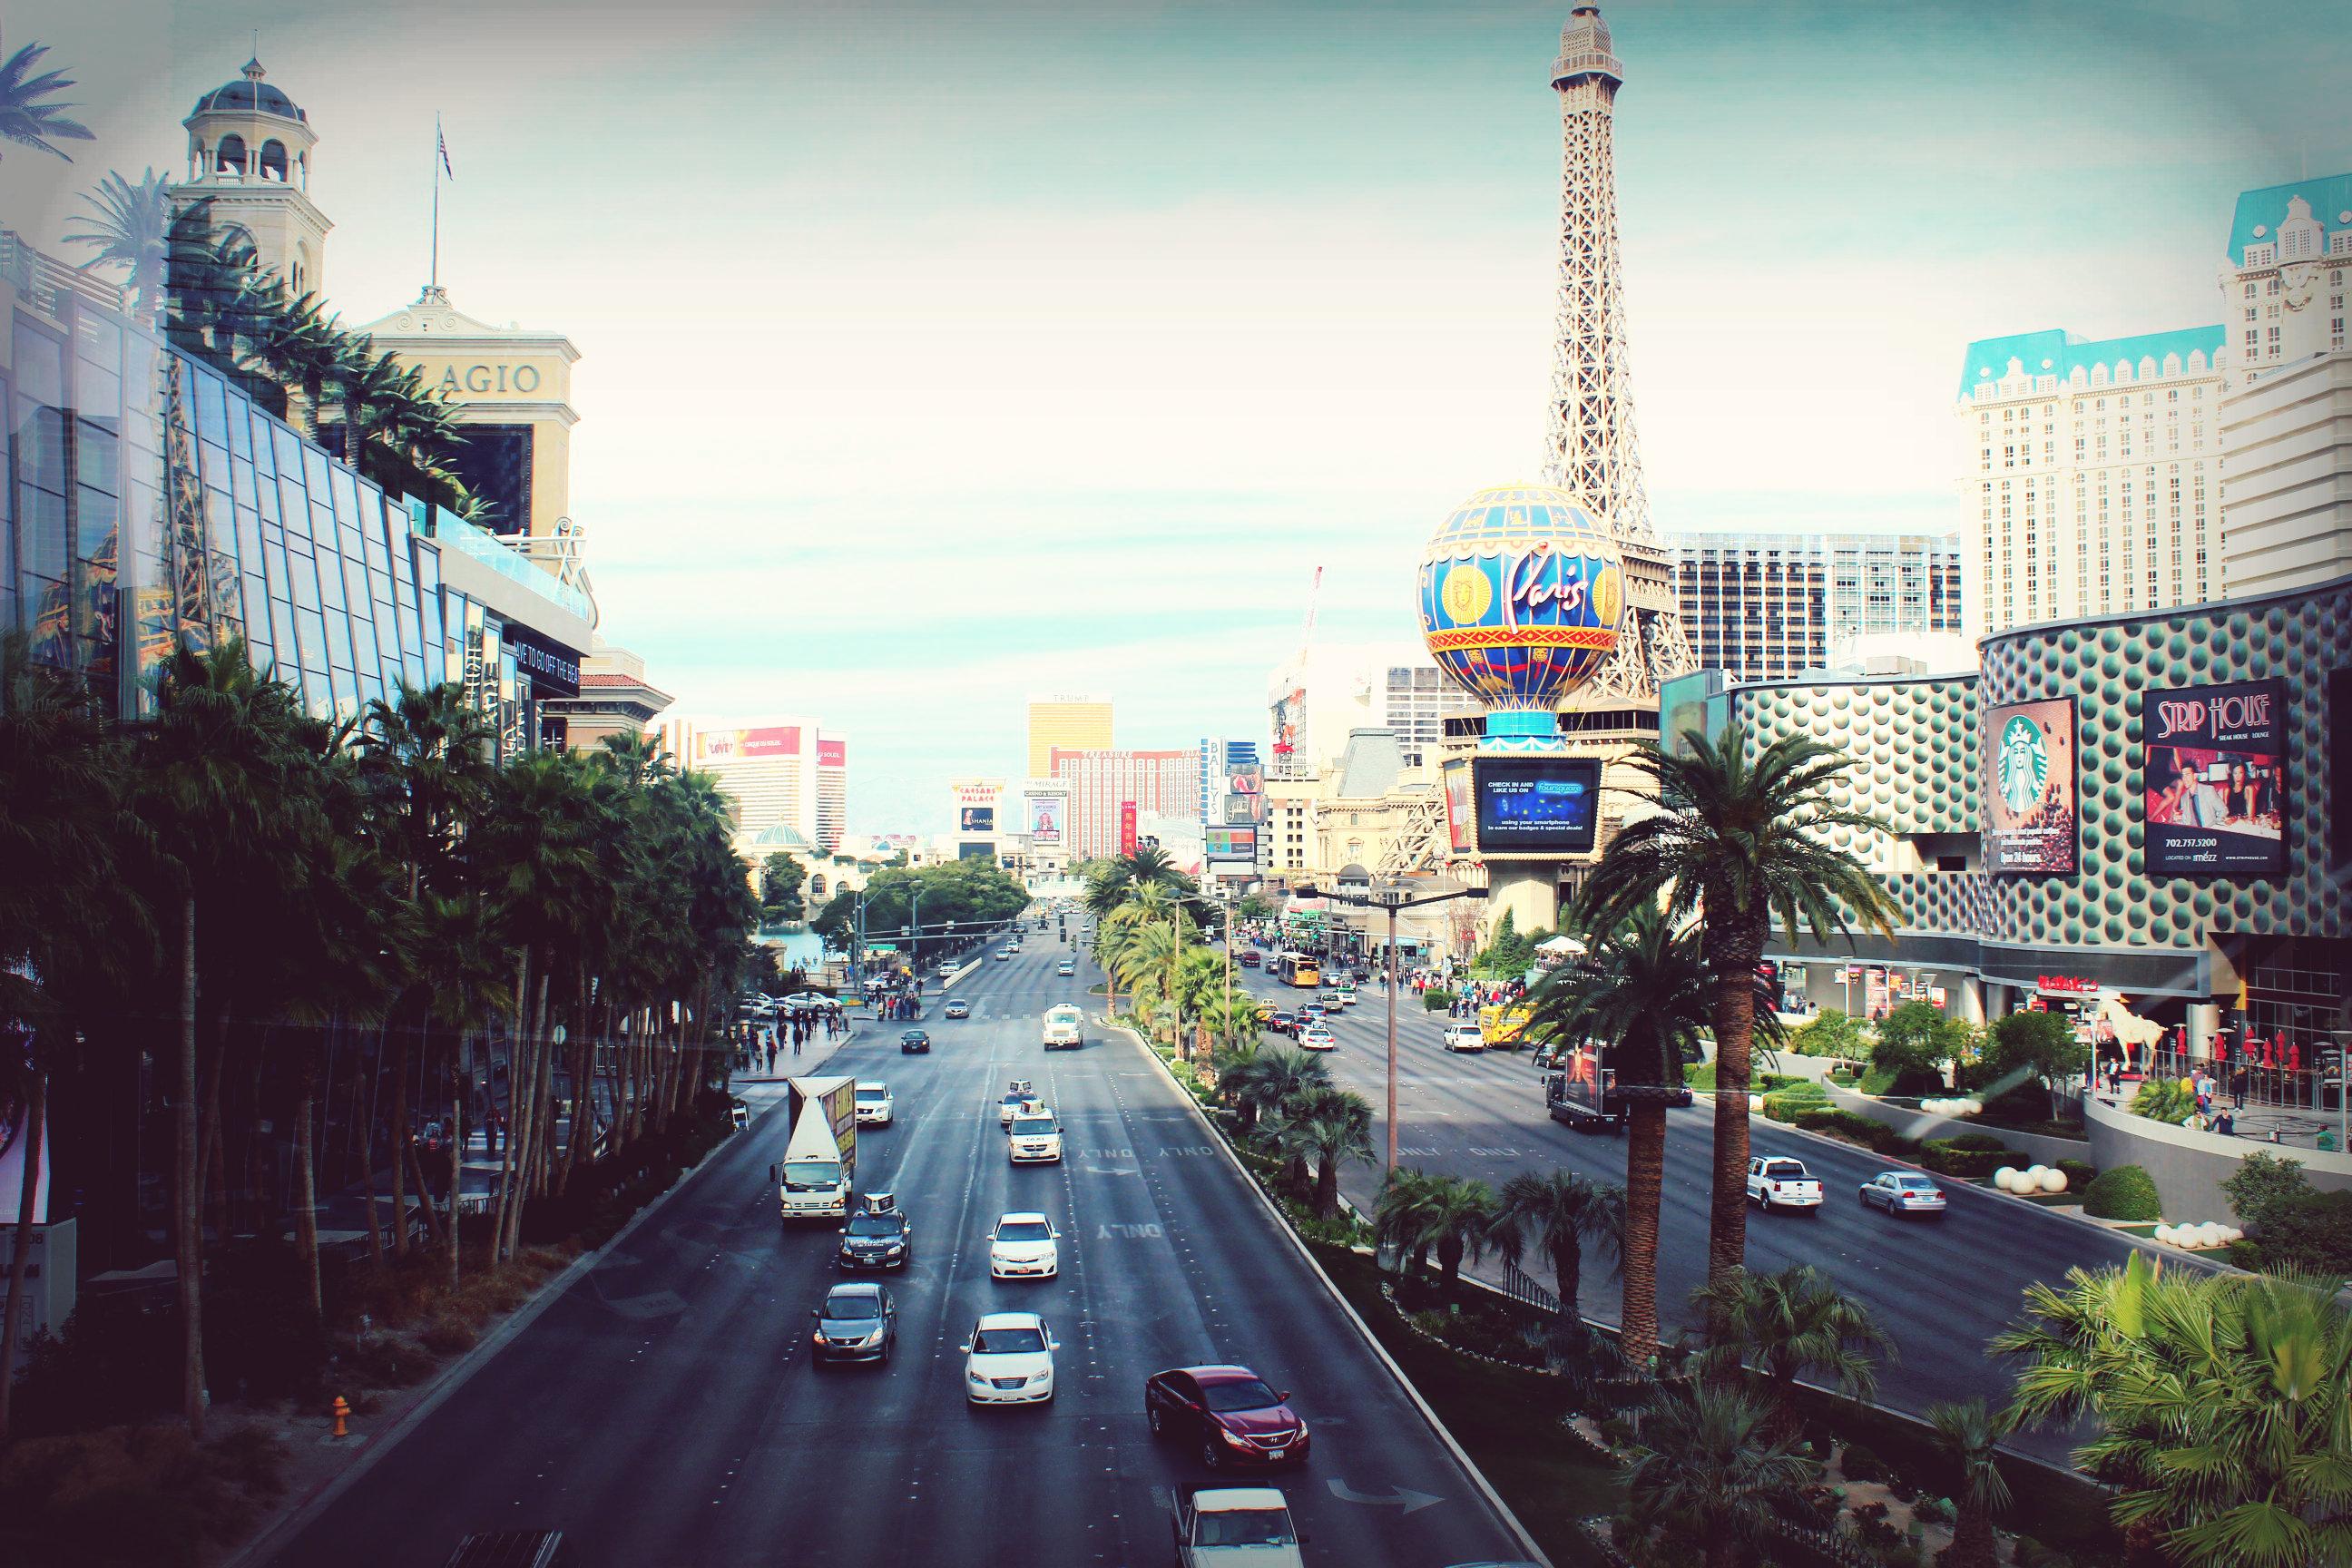 Le Strip Las Vegas